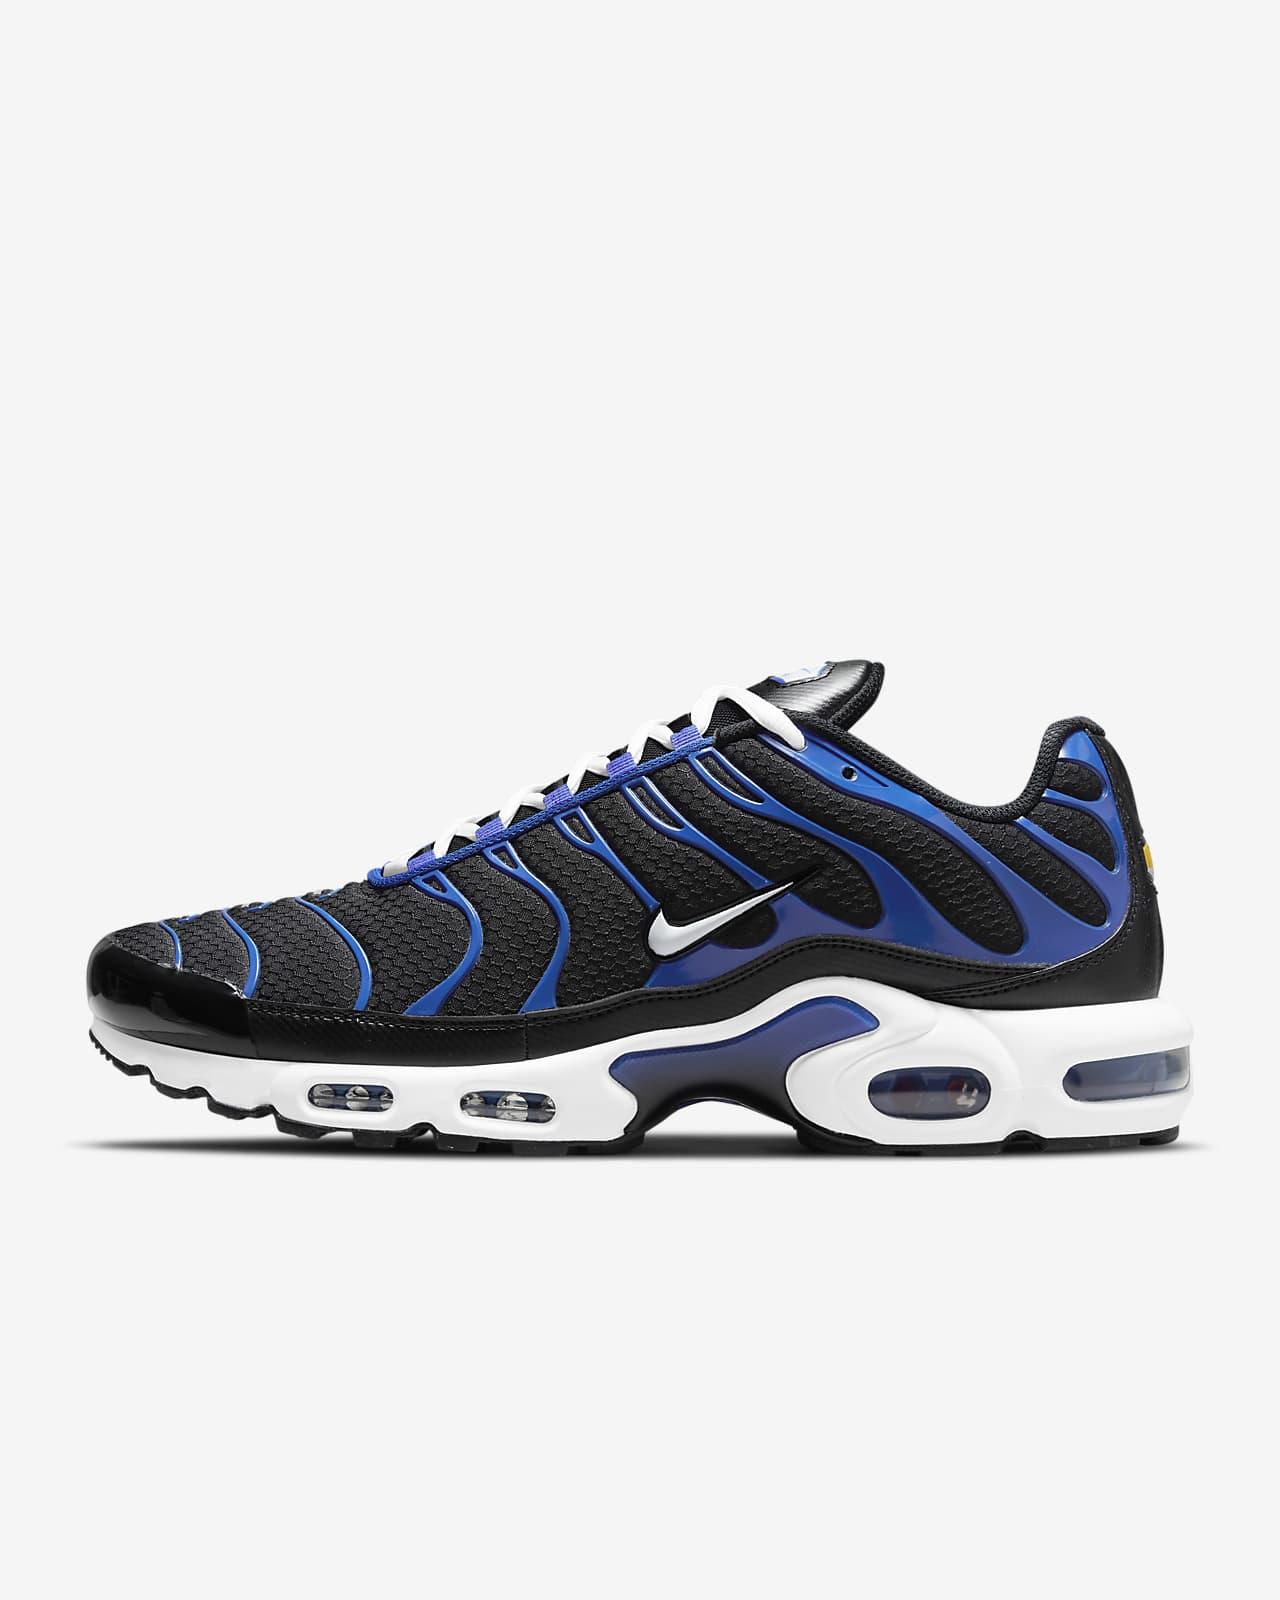 Chaussure Nike Air Max Plus pour Homme